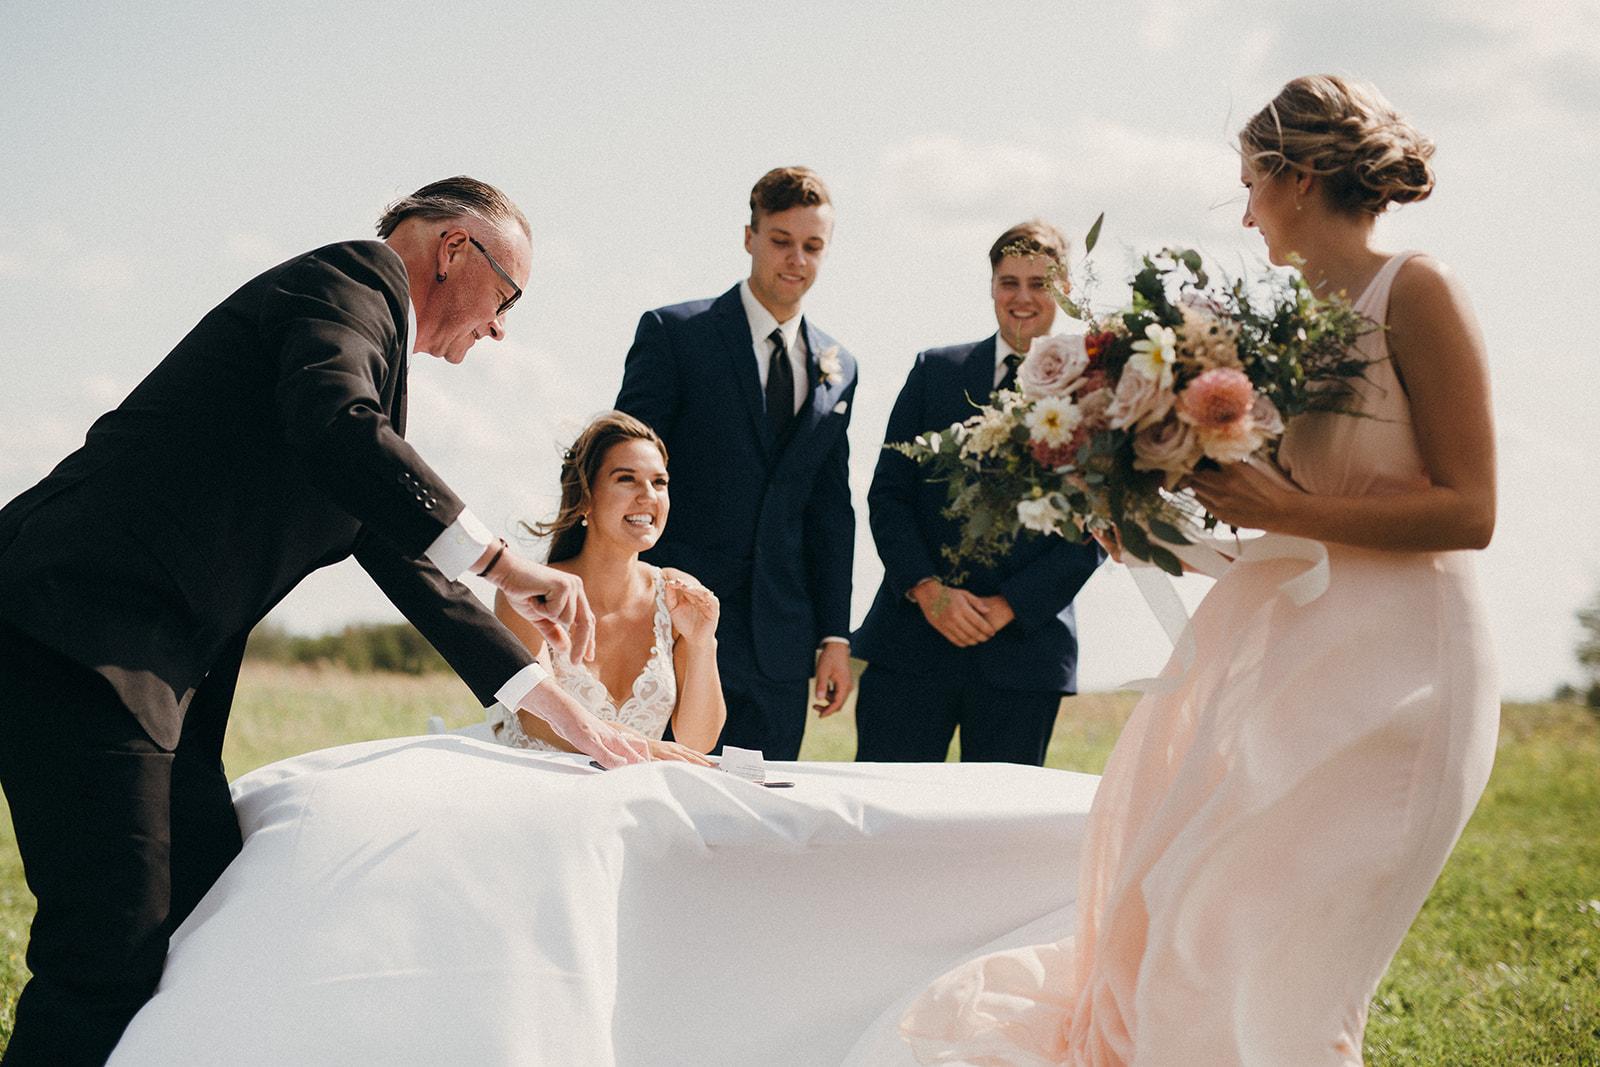 kaden_justine_wedding_1338.jpg